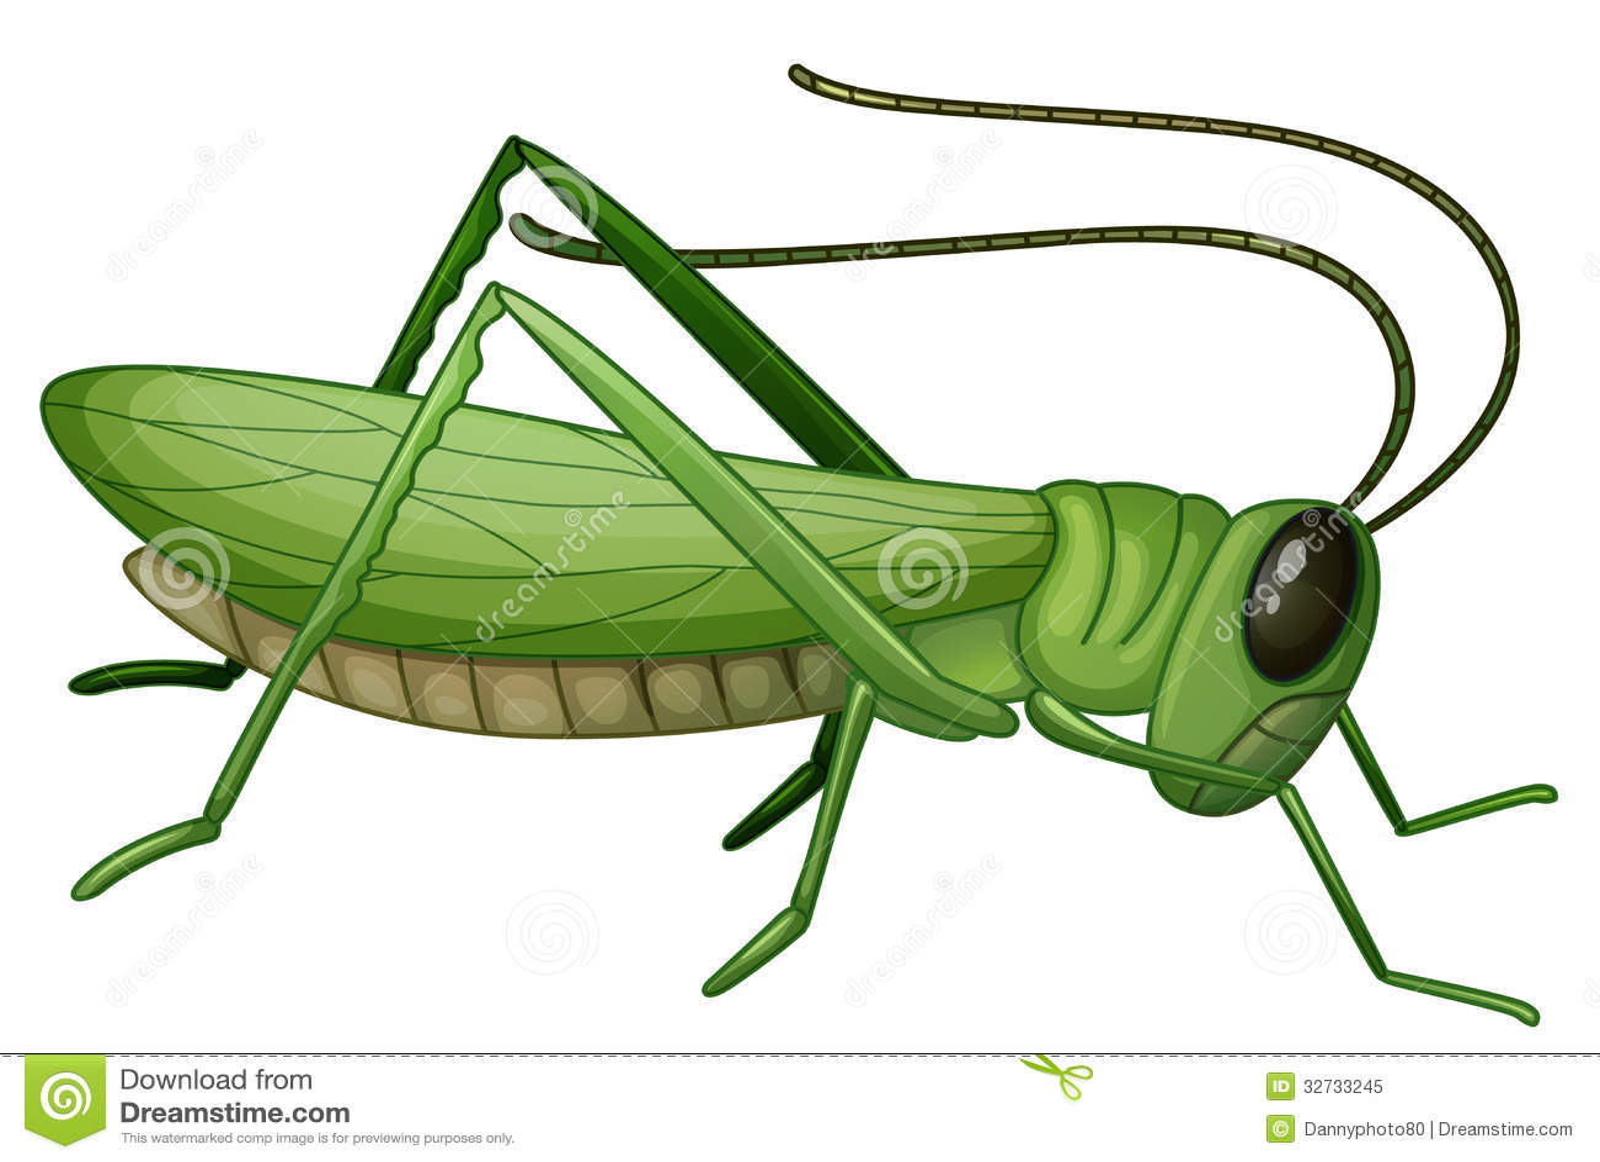 Grasshopper Royalty Free Stock Photo - Image: 32733245